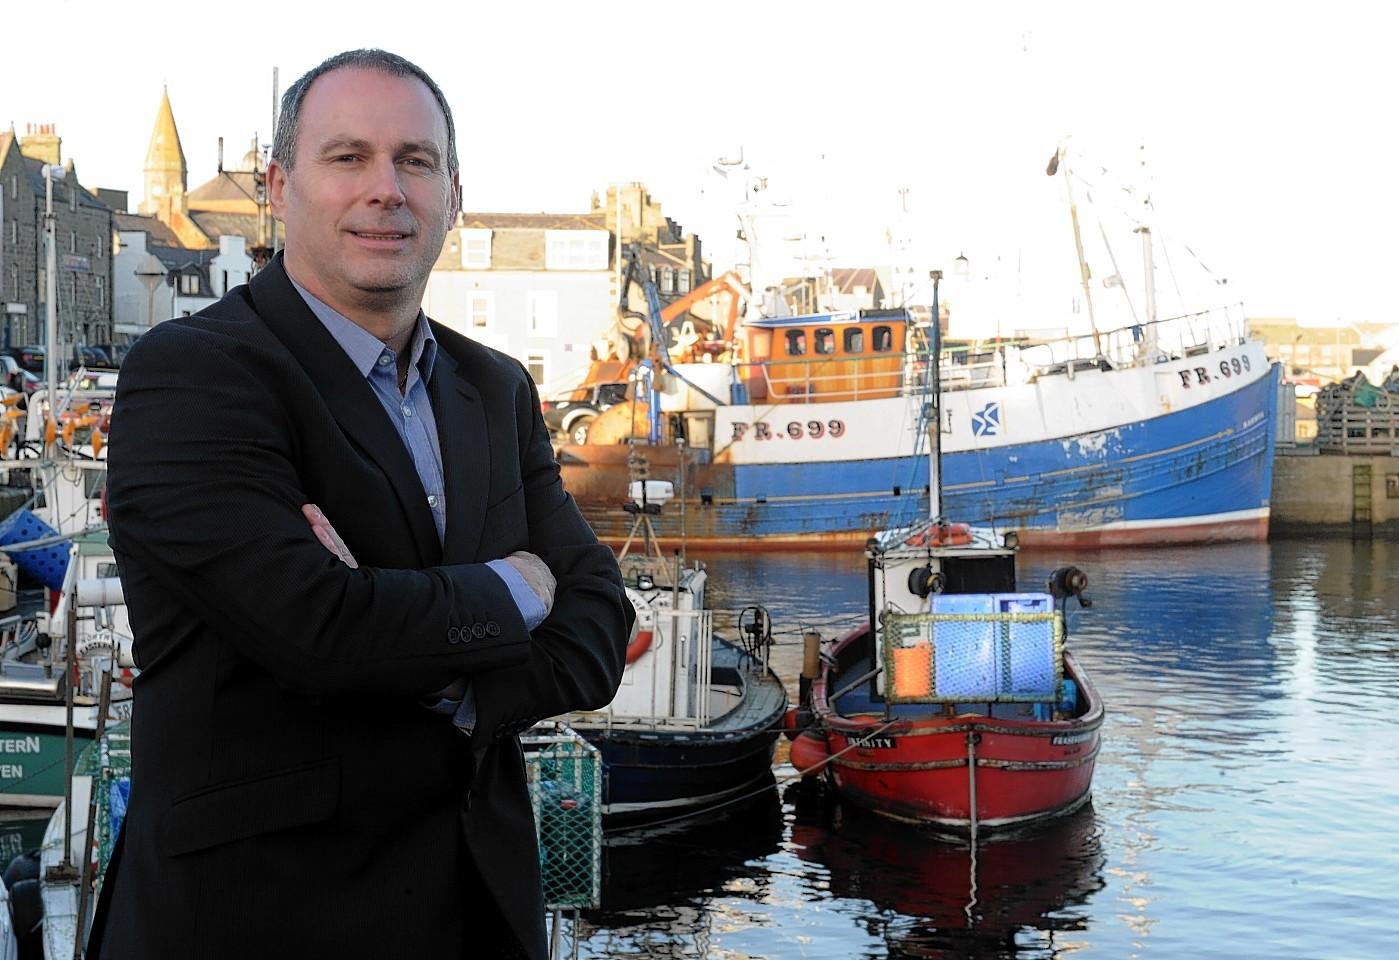 Scottish White Fish Producers' Association chief executive Mike Park who appeared alongside Jim Portus